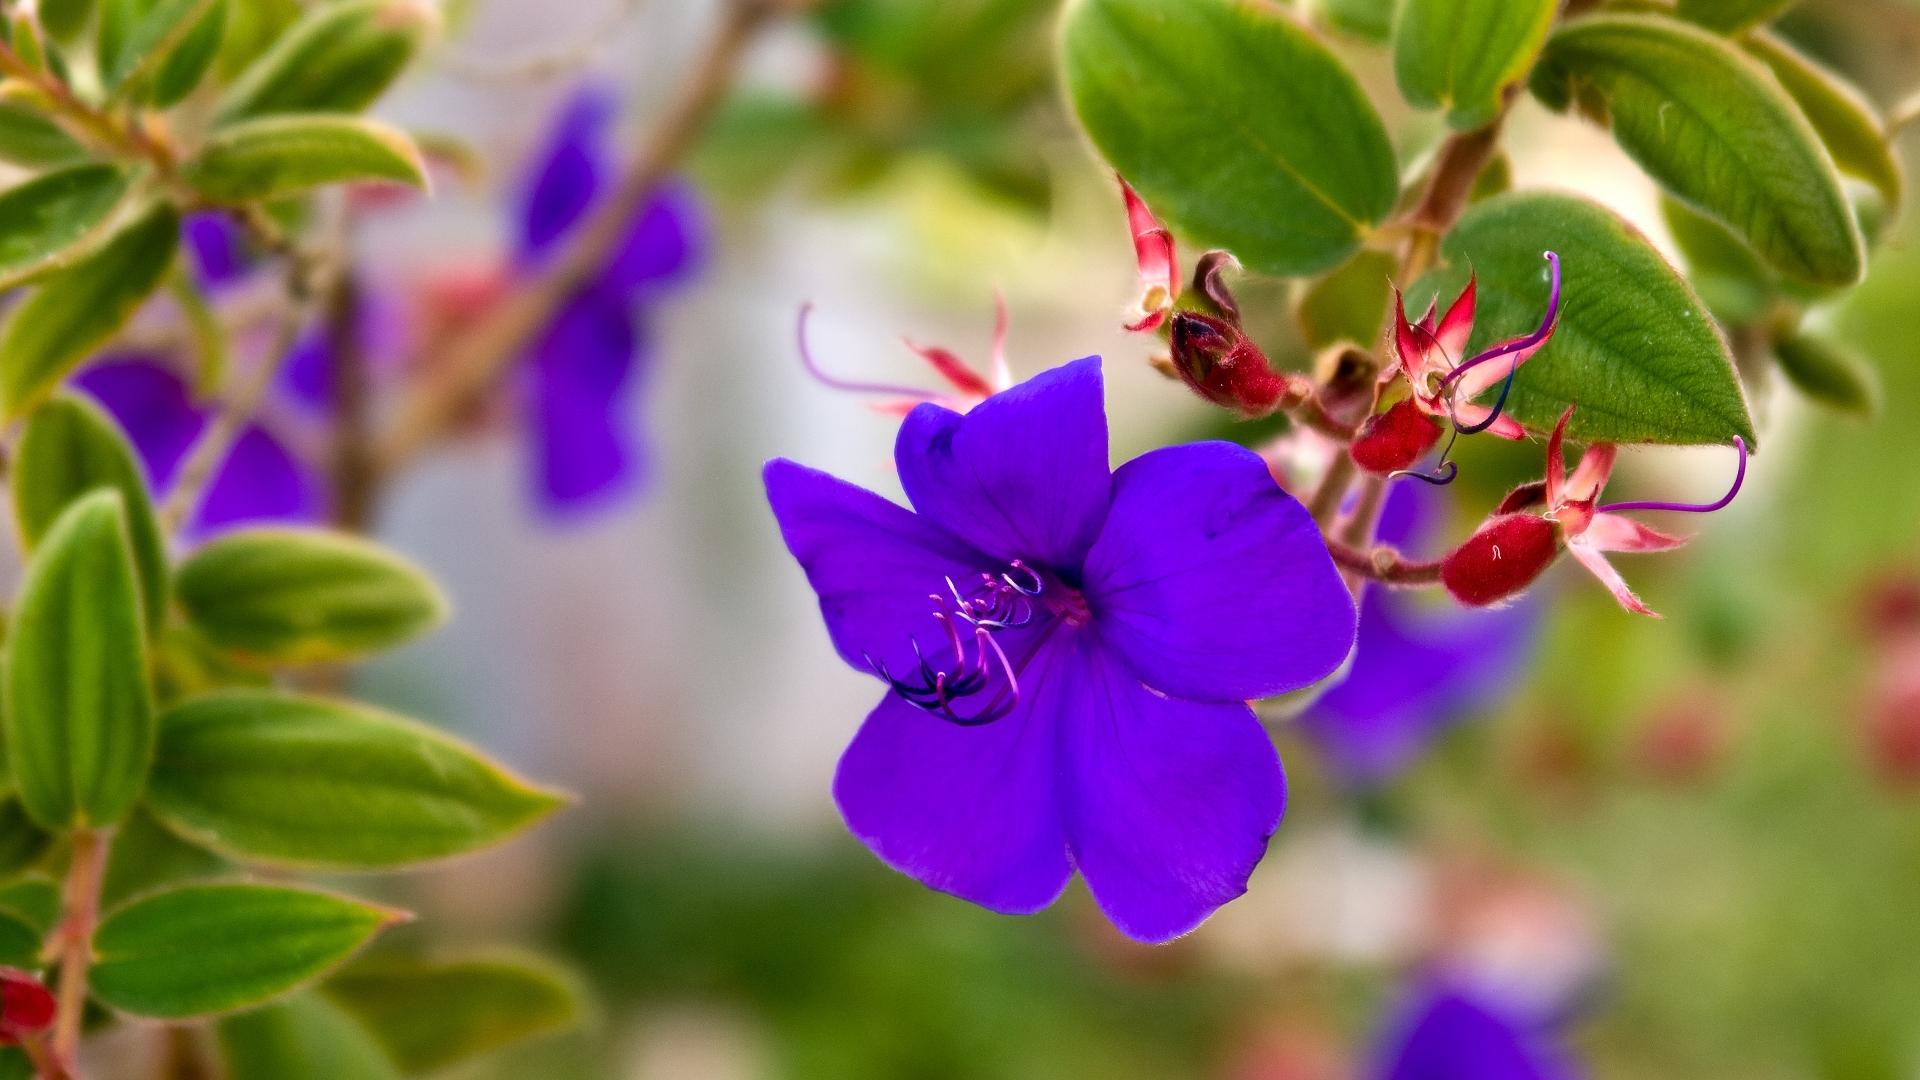 download wallpaper 1920x1080 flowers violets grass